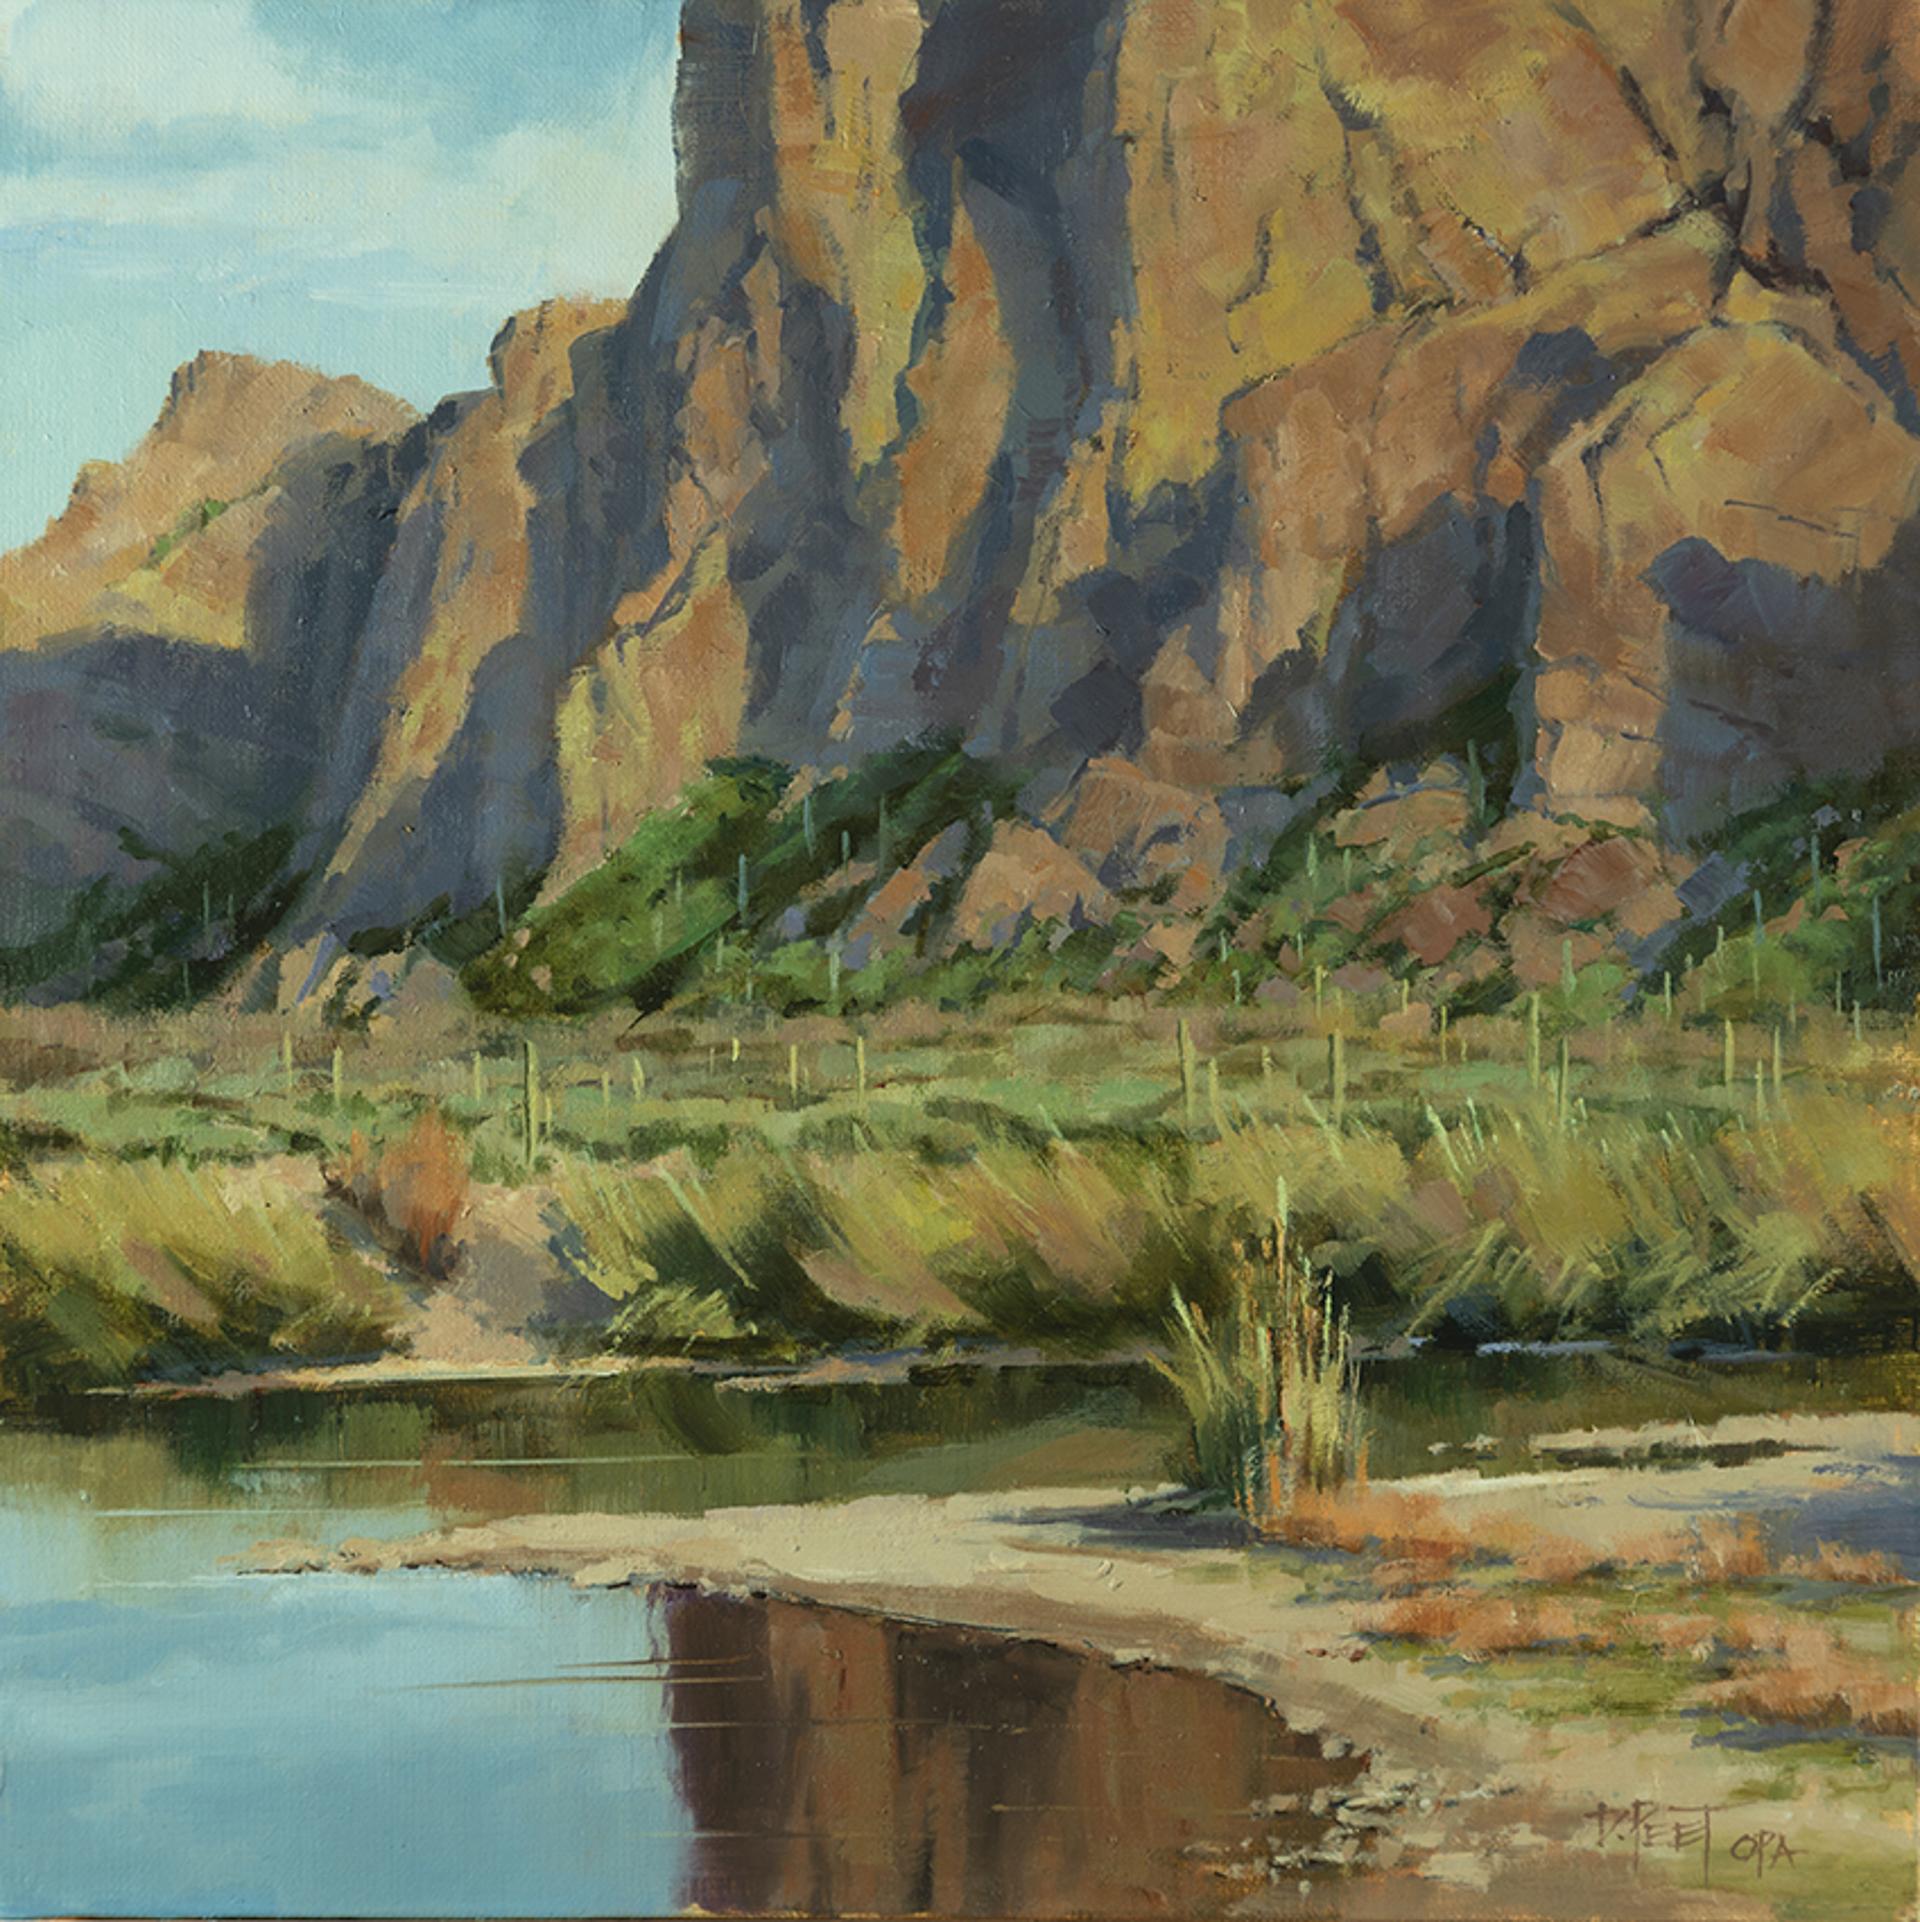 Desert Cliff Reflections by Darcie Peet